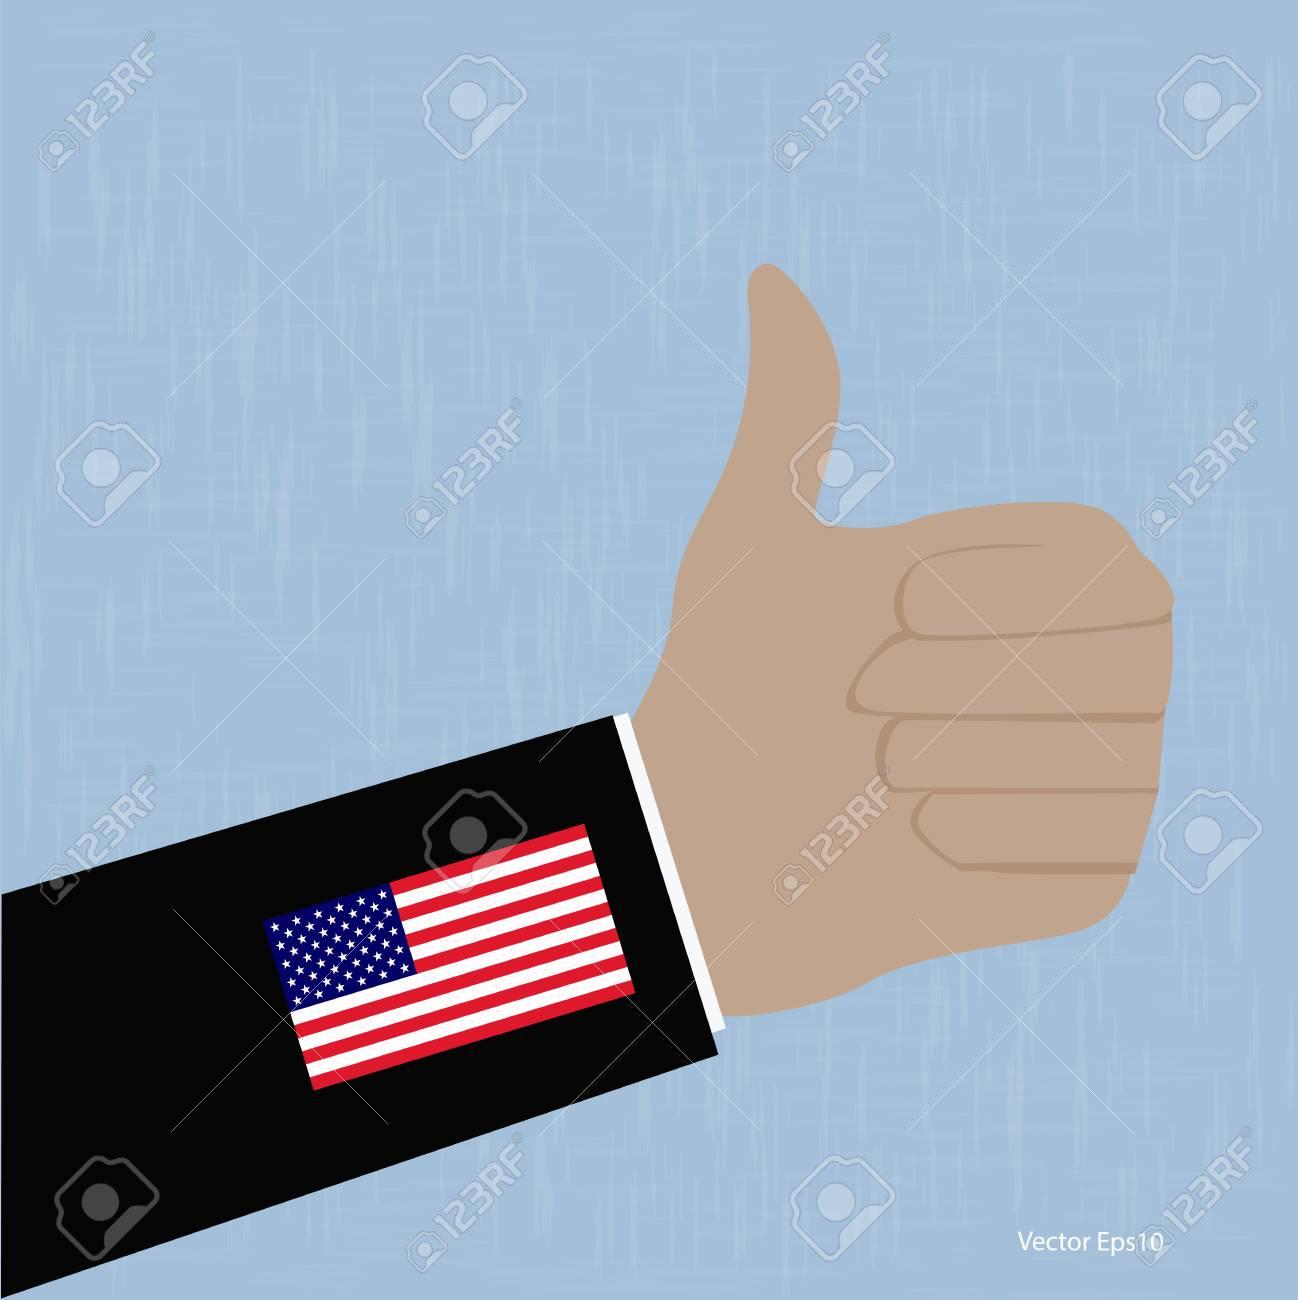 USA Like Thumbs Up symbol  vector Eps10 illustration Stock Vector - 18216705